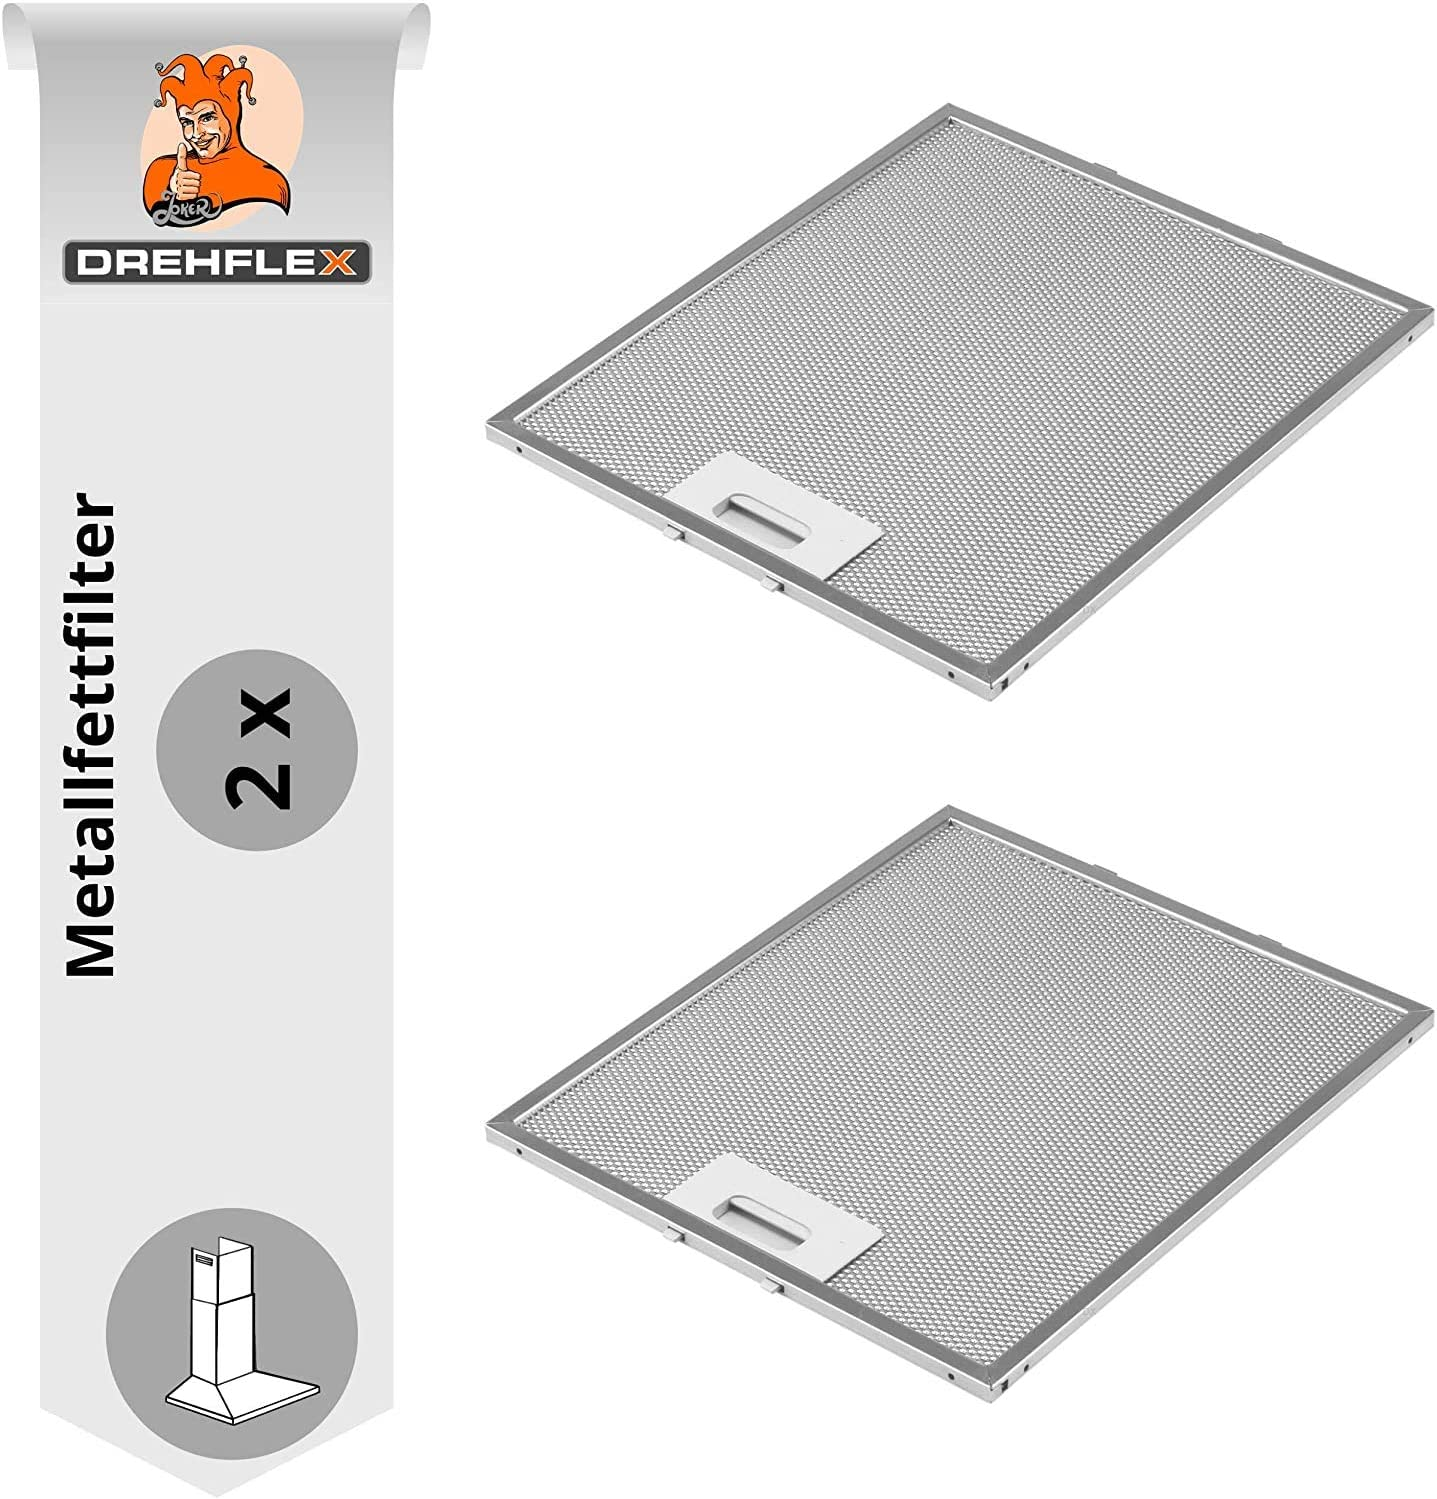 DREHFLEX AK109-2 - 2 filtros metálicos para campana extractora (305 x 267 mm, AEG Electrolux 405525042-9 Elica GRI0009219A KIT0010805 93952919 Whirlpool Bauknecht 480122102168 C00314158 ARI314158)